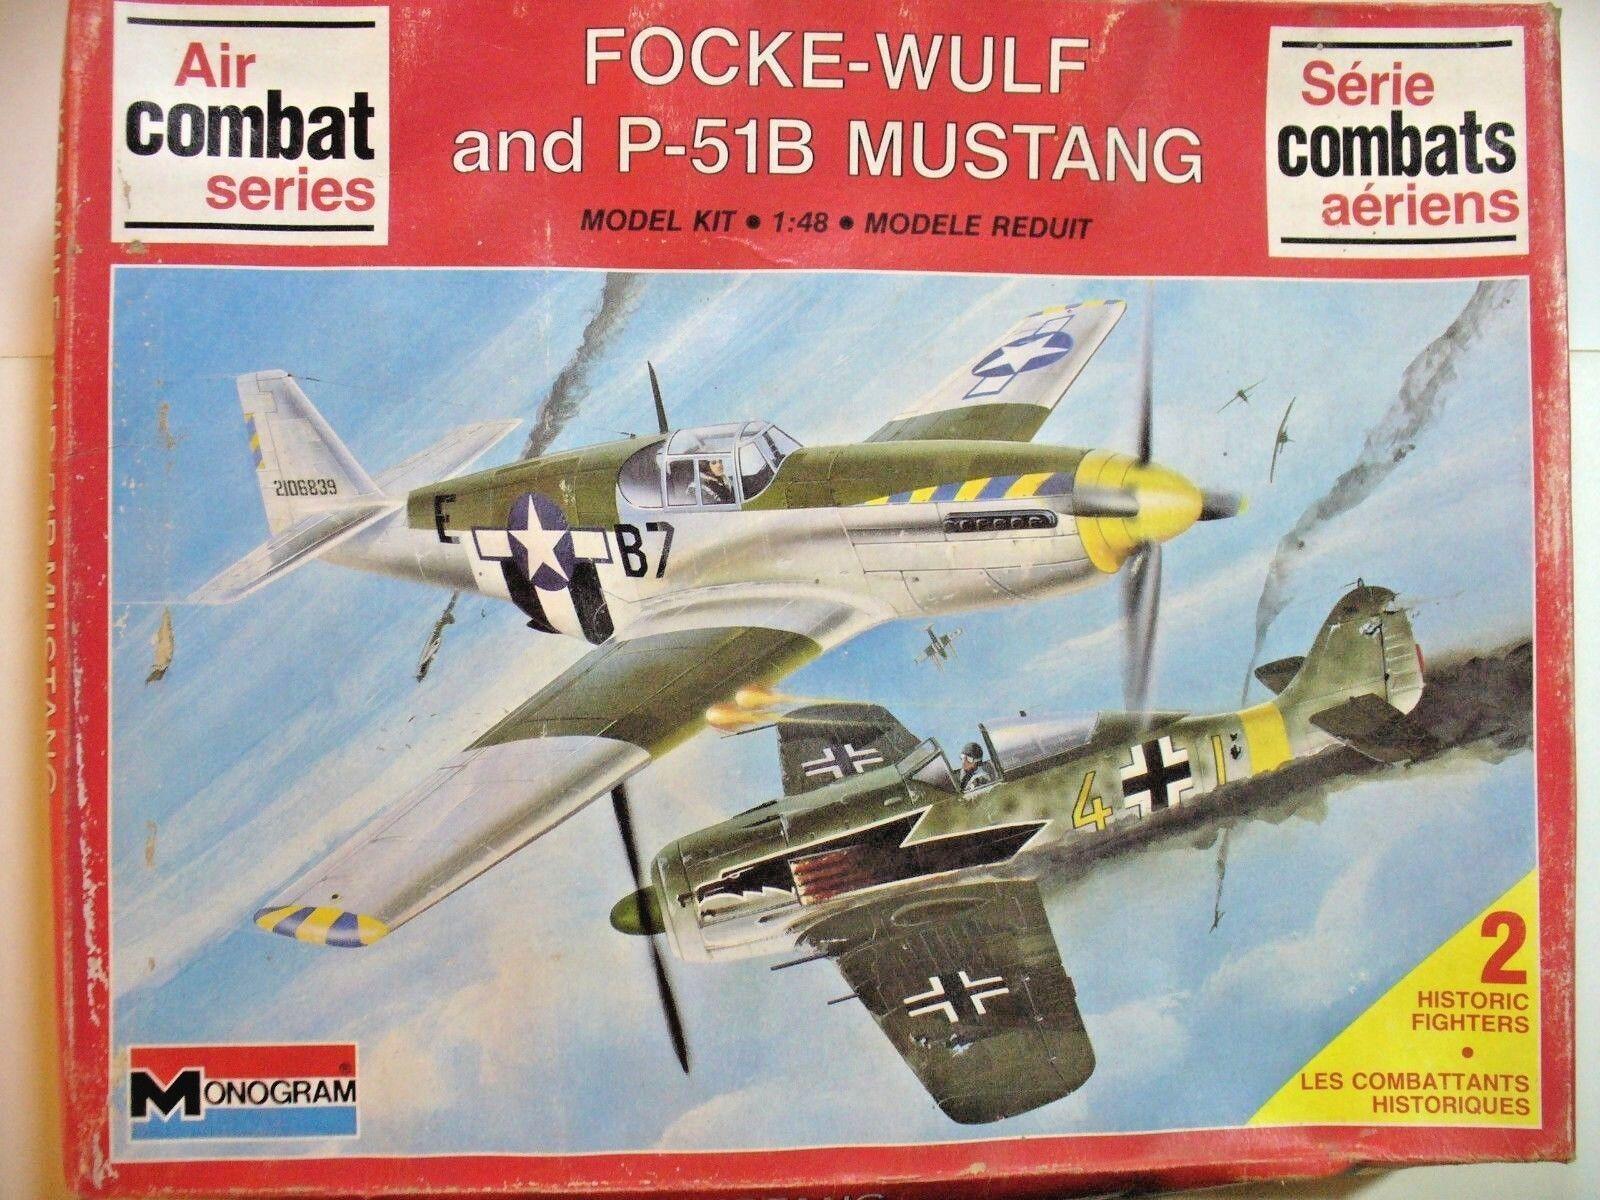 FOCKE FOCKE FOCKE WOLF 190 + P 51 B MUSTANG  1 48 MONOGRAM scatola 36x29x6 cm cce6a4